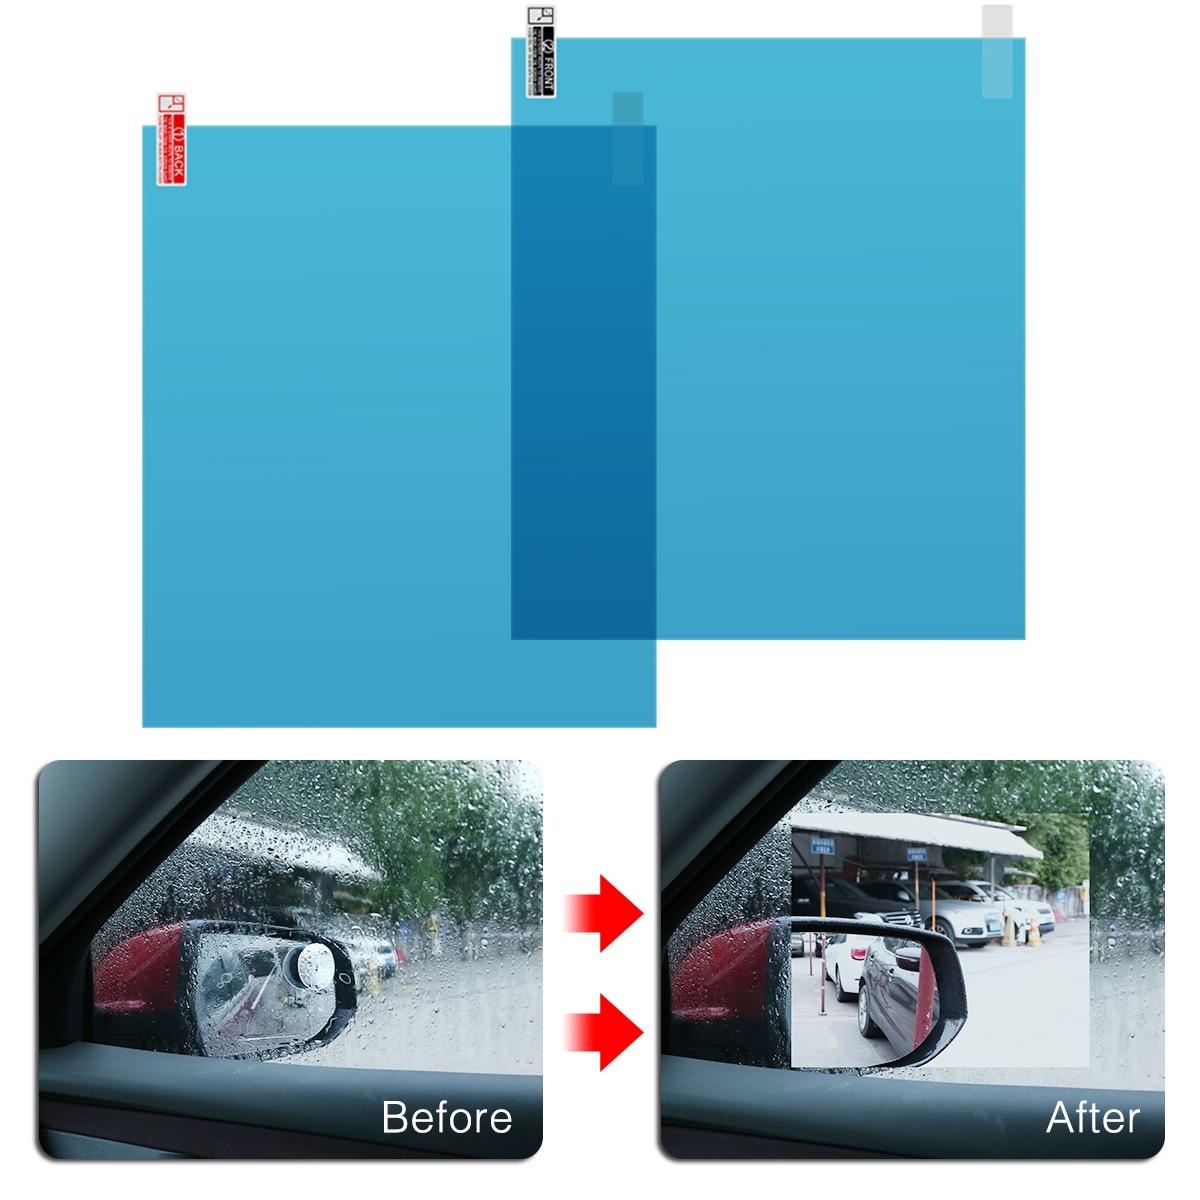 2Pcs 170*200mm Car Anti Water Fog Window Film Protective Rainproof Rearview Mirror Accessories